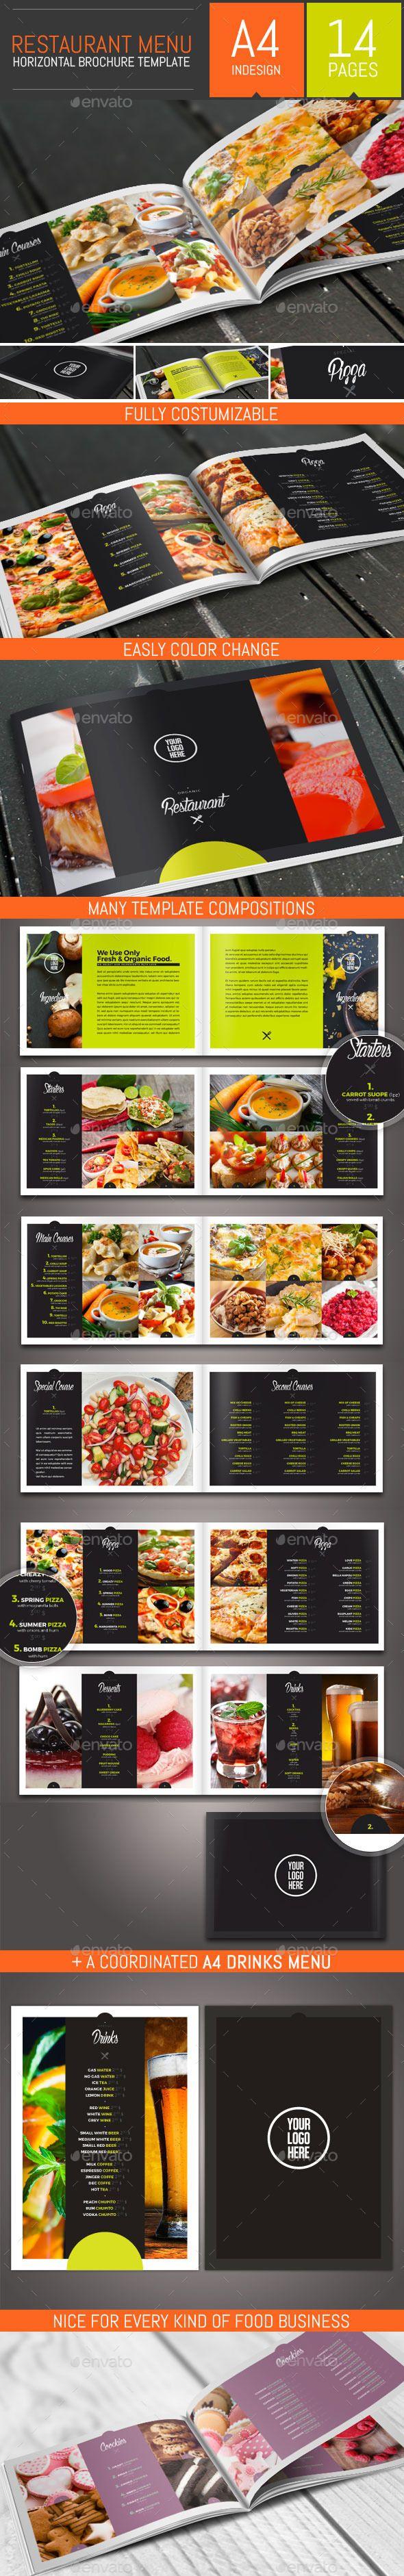 Food Restaurant Menu Brochure / Bi-Fold Template #design Download: http://graphicriver.net/item/food-restaurant-menu-brochure-bifold-template/13161264?ref=ksioks